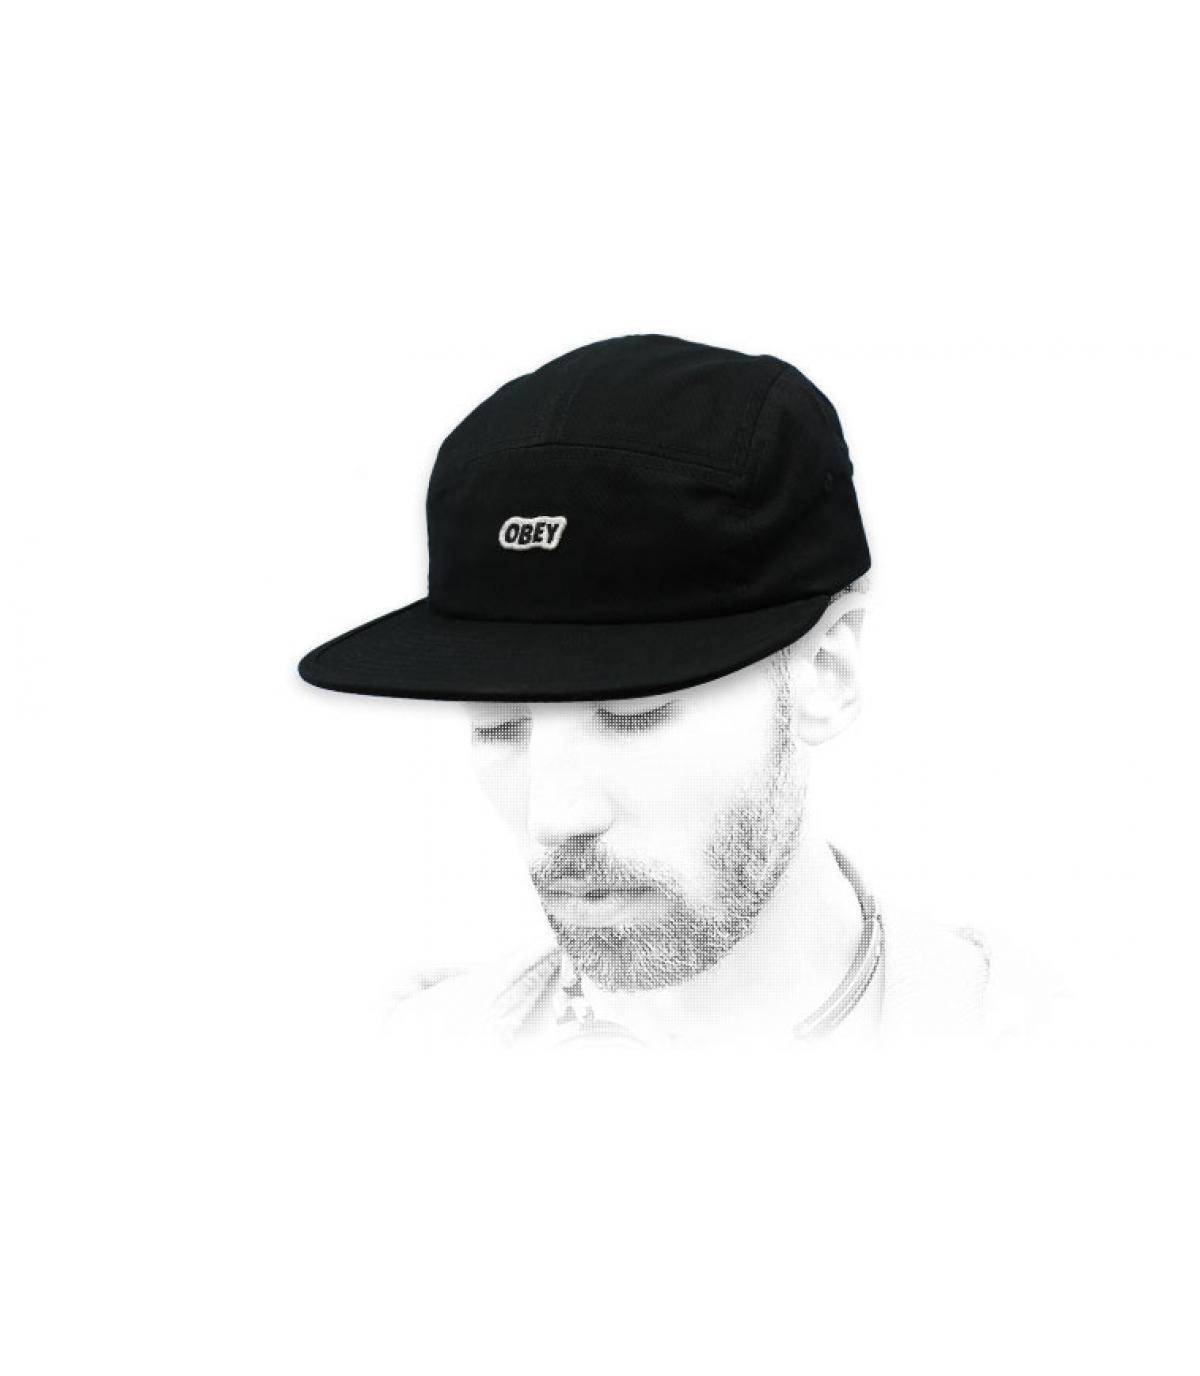 black 5 panel cap Obey